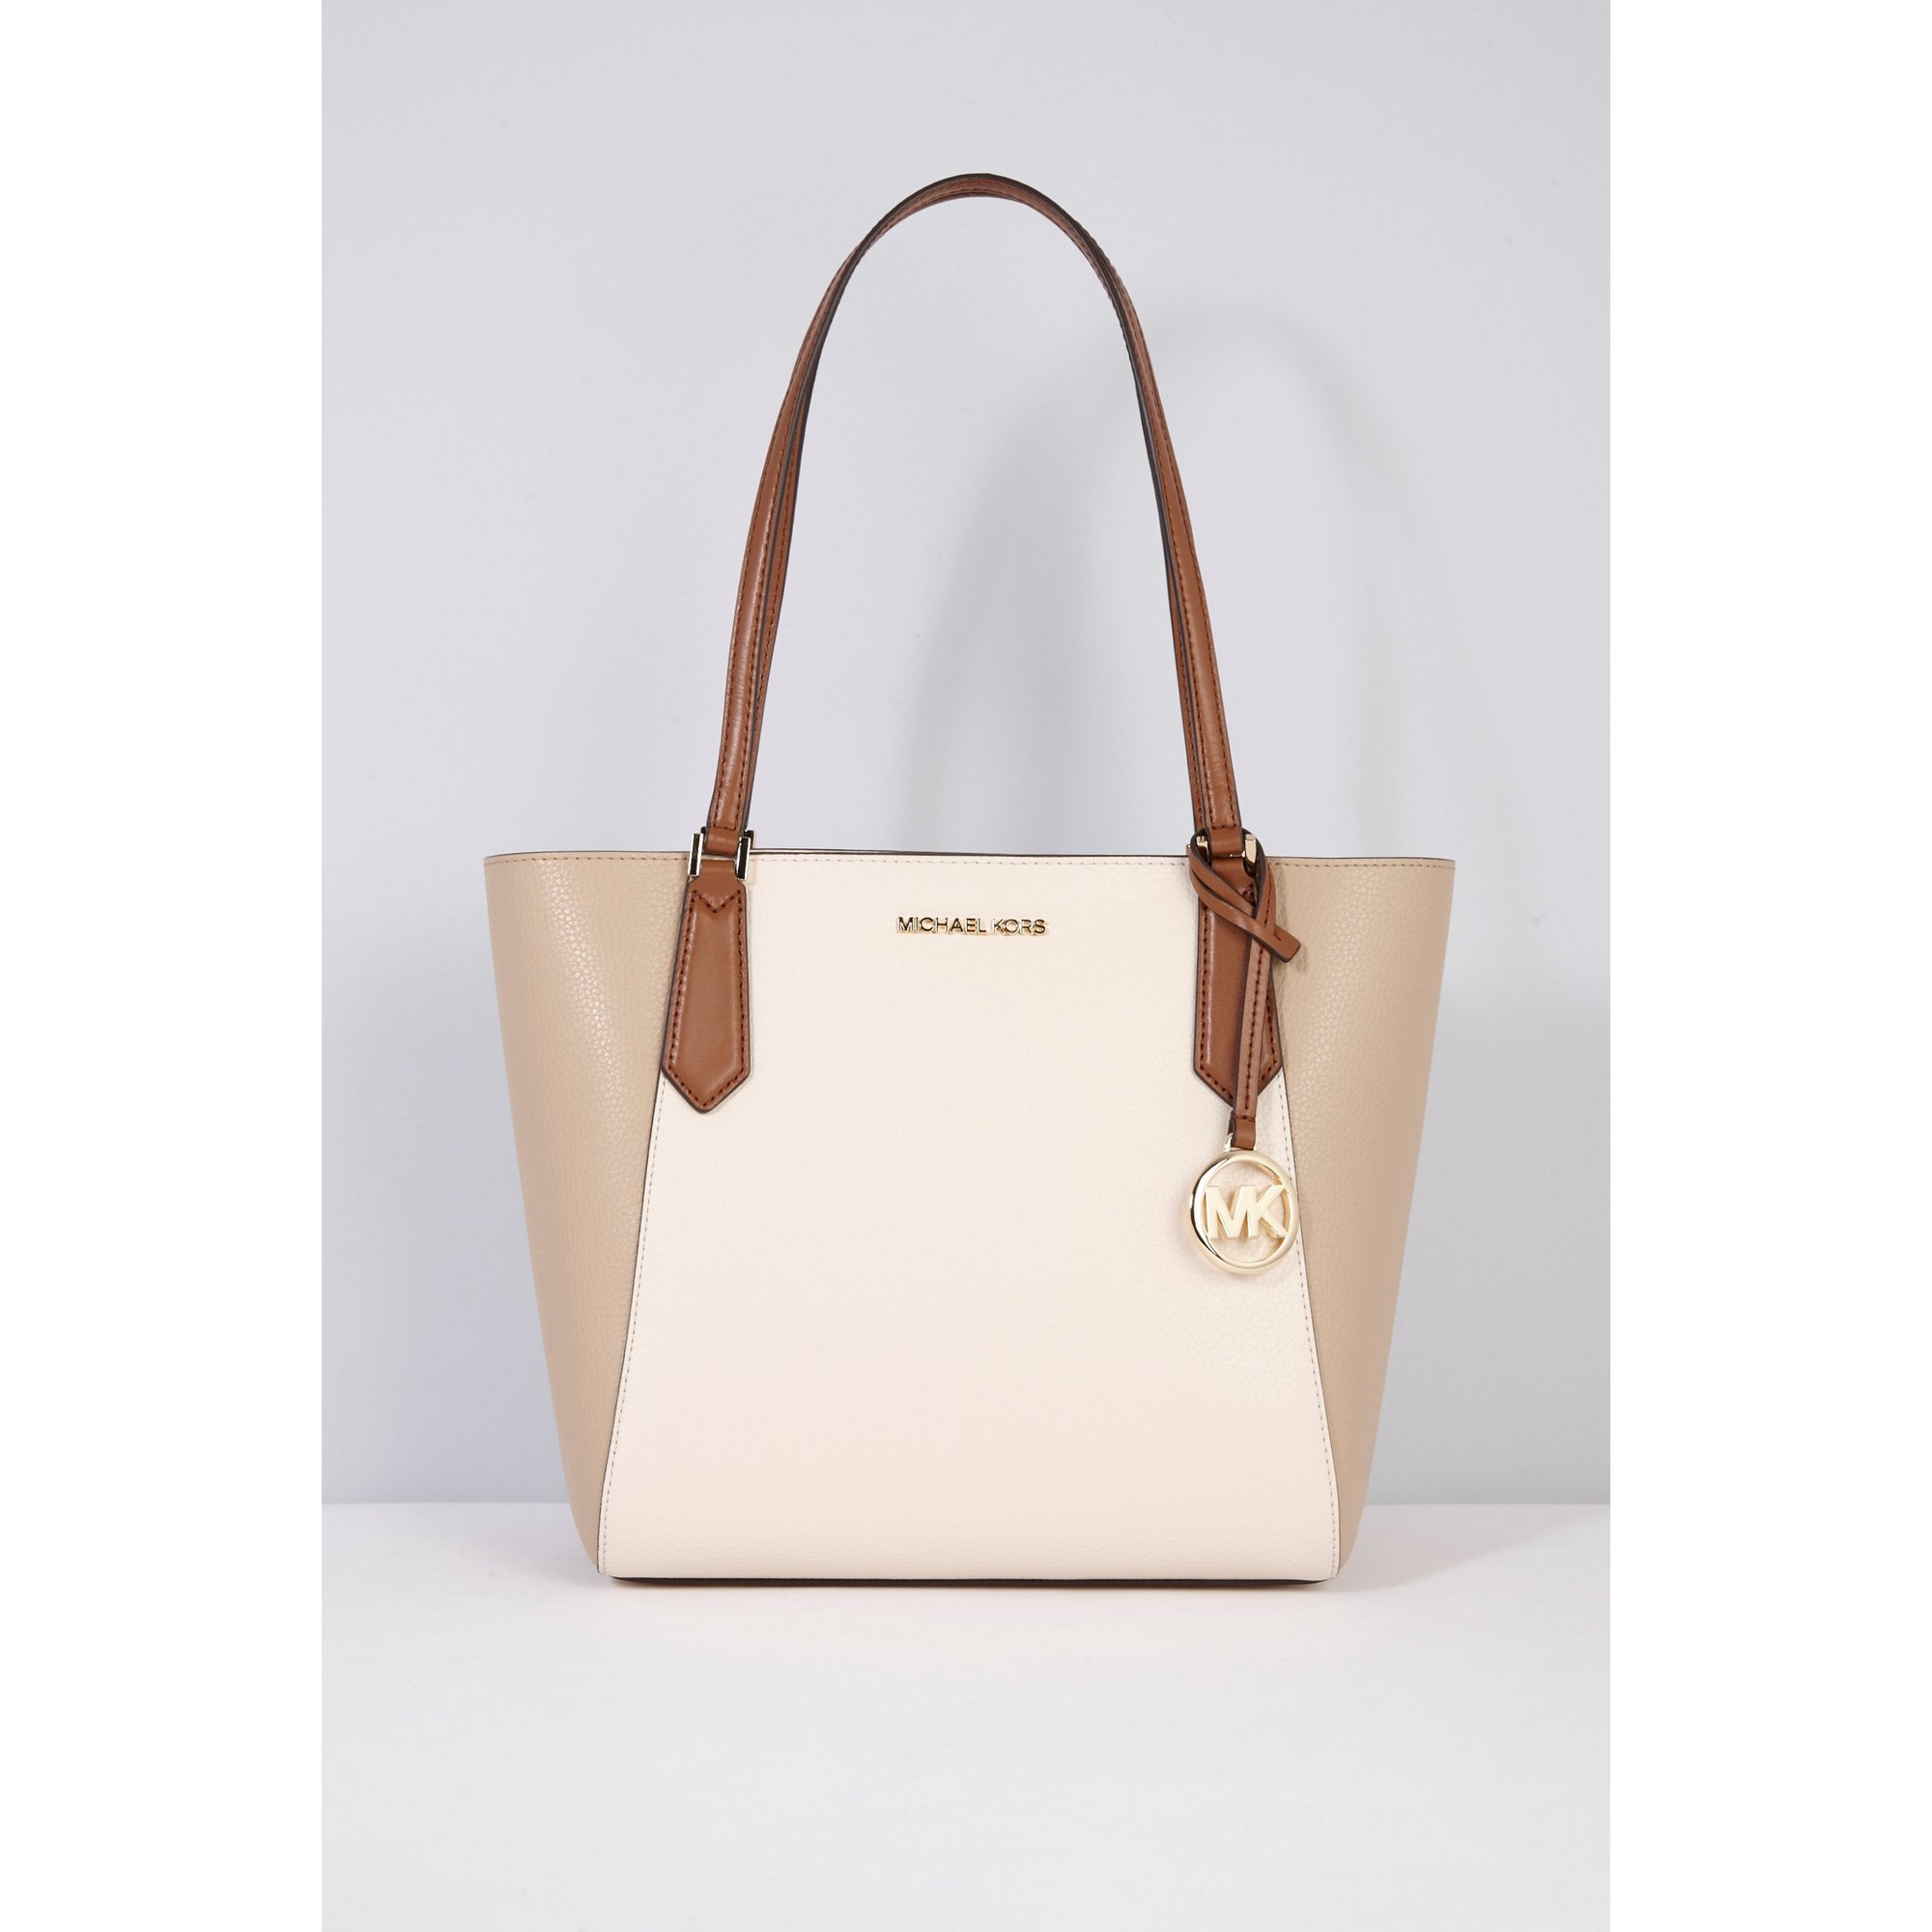 Image of Michael Kors Cream Kimberly Leather Tote Bag